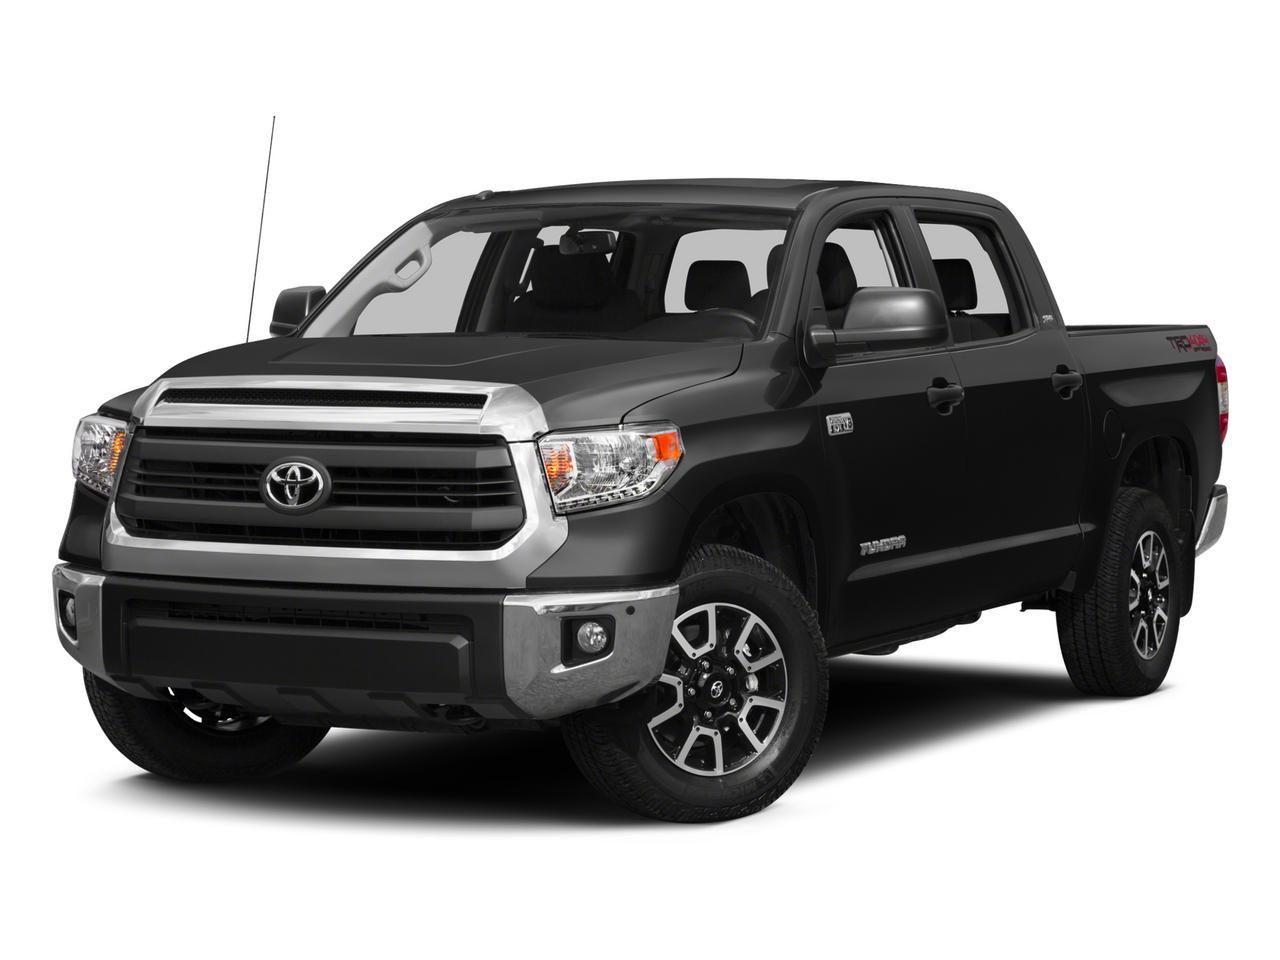 2015 Toyota Tundra 2WD Truck Vehicle Photo in San Antonio, TX 78238